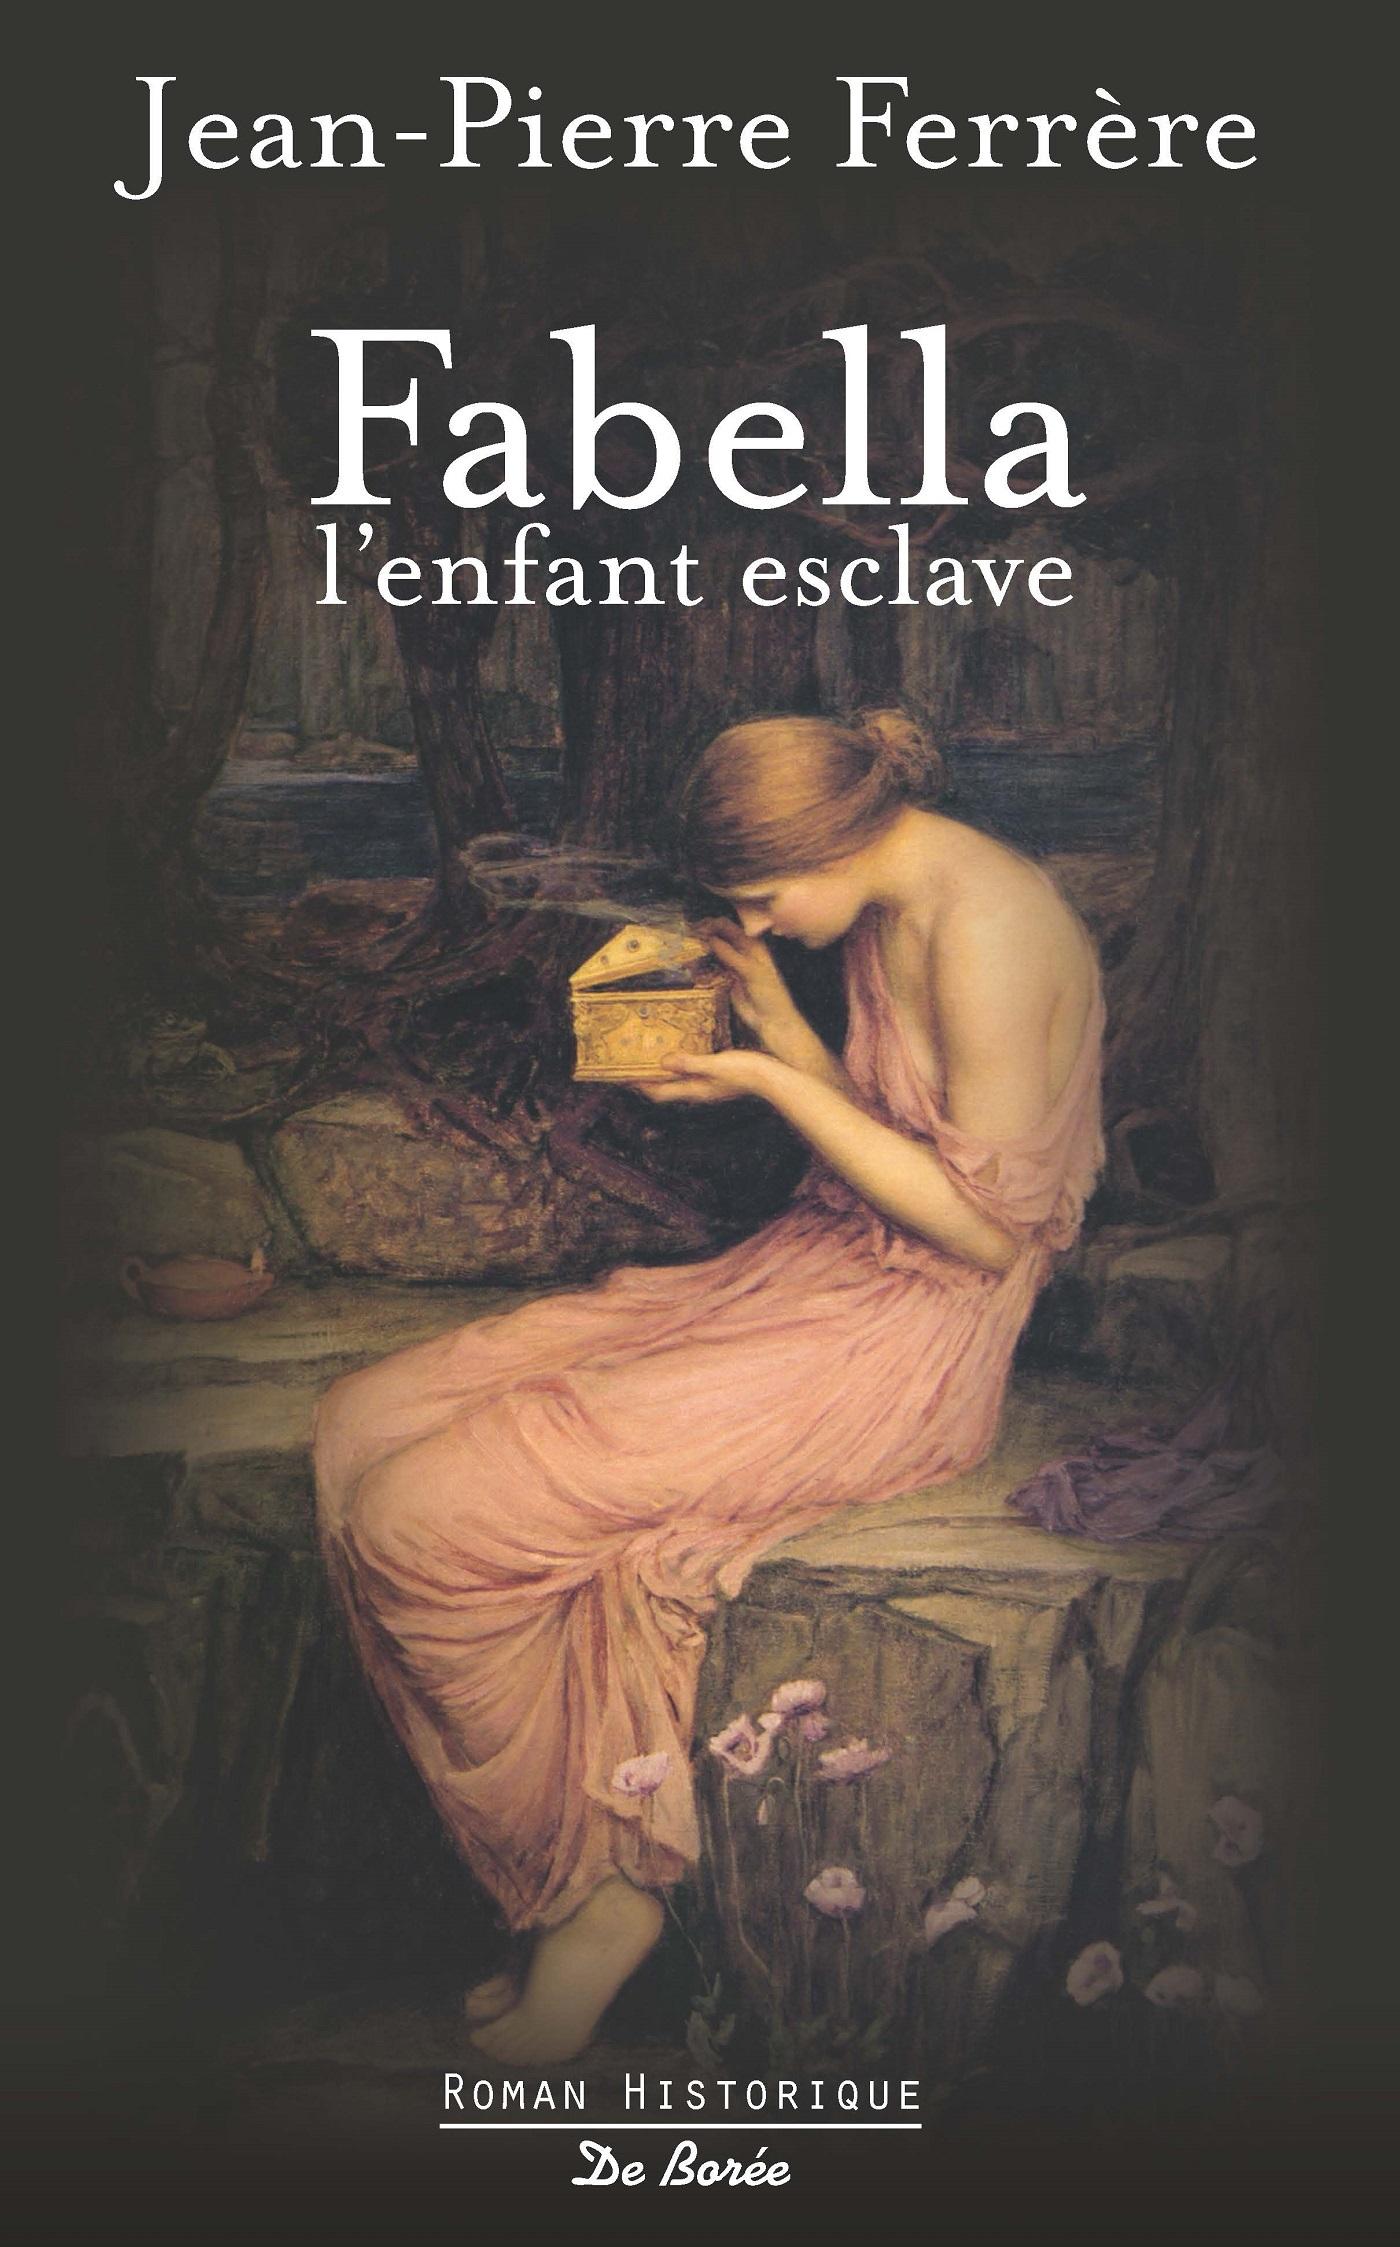 FABELLA L'ENFANT ESCLAVE